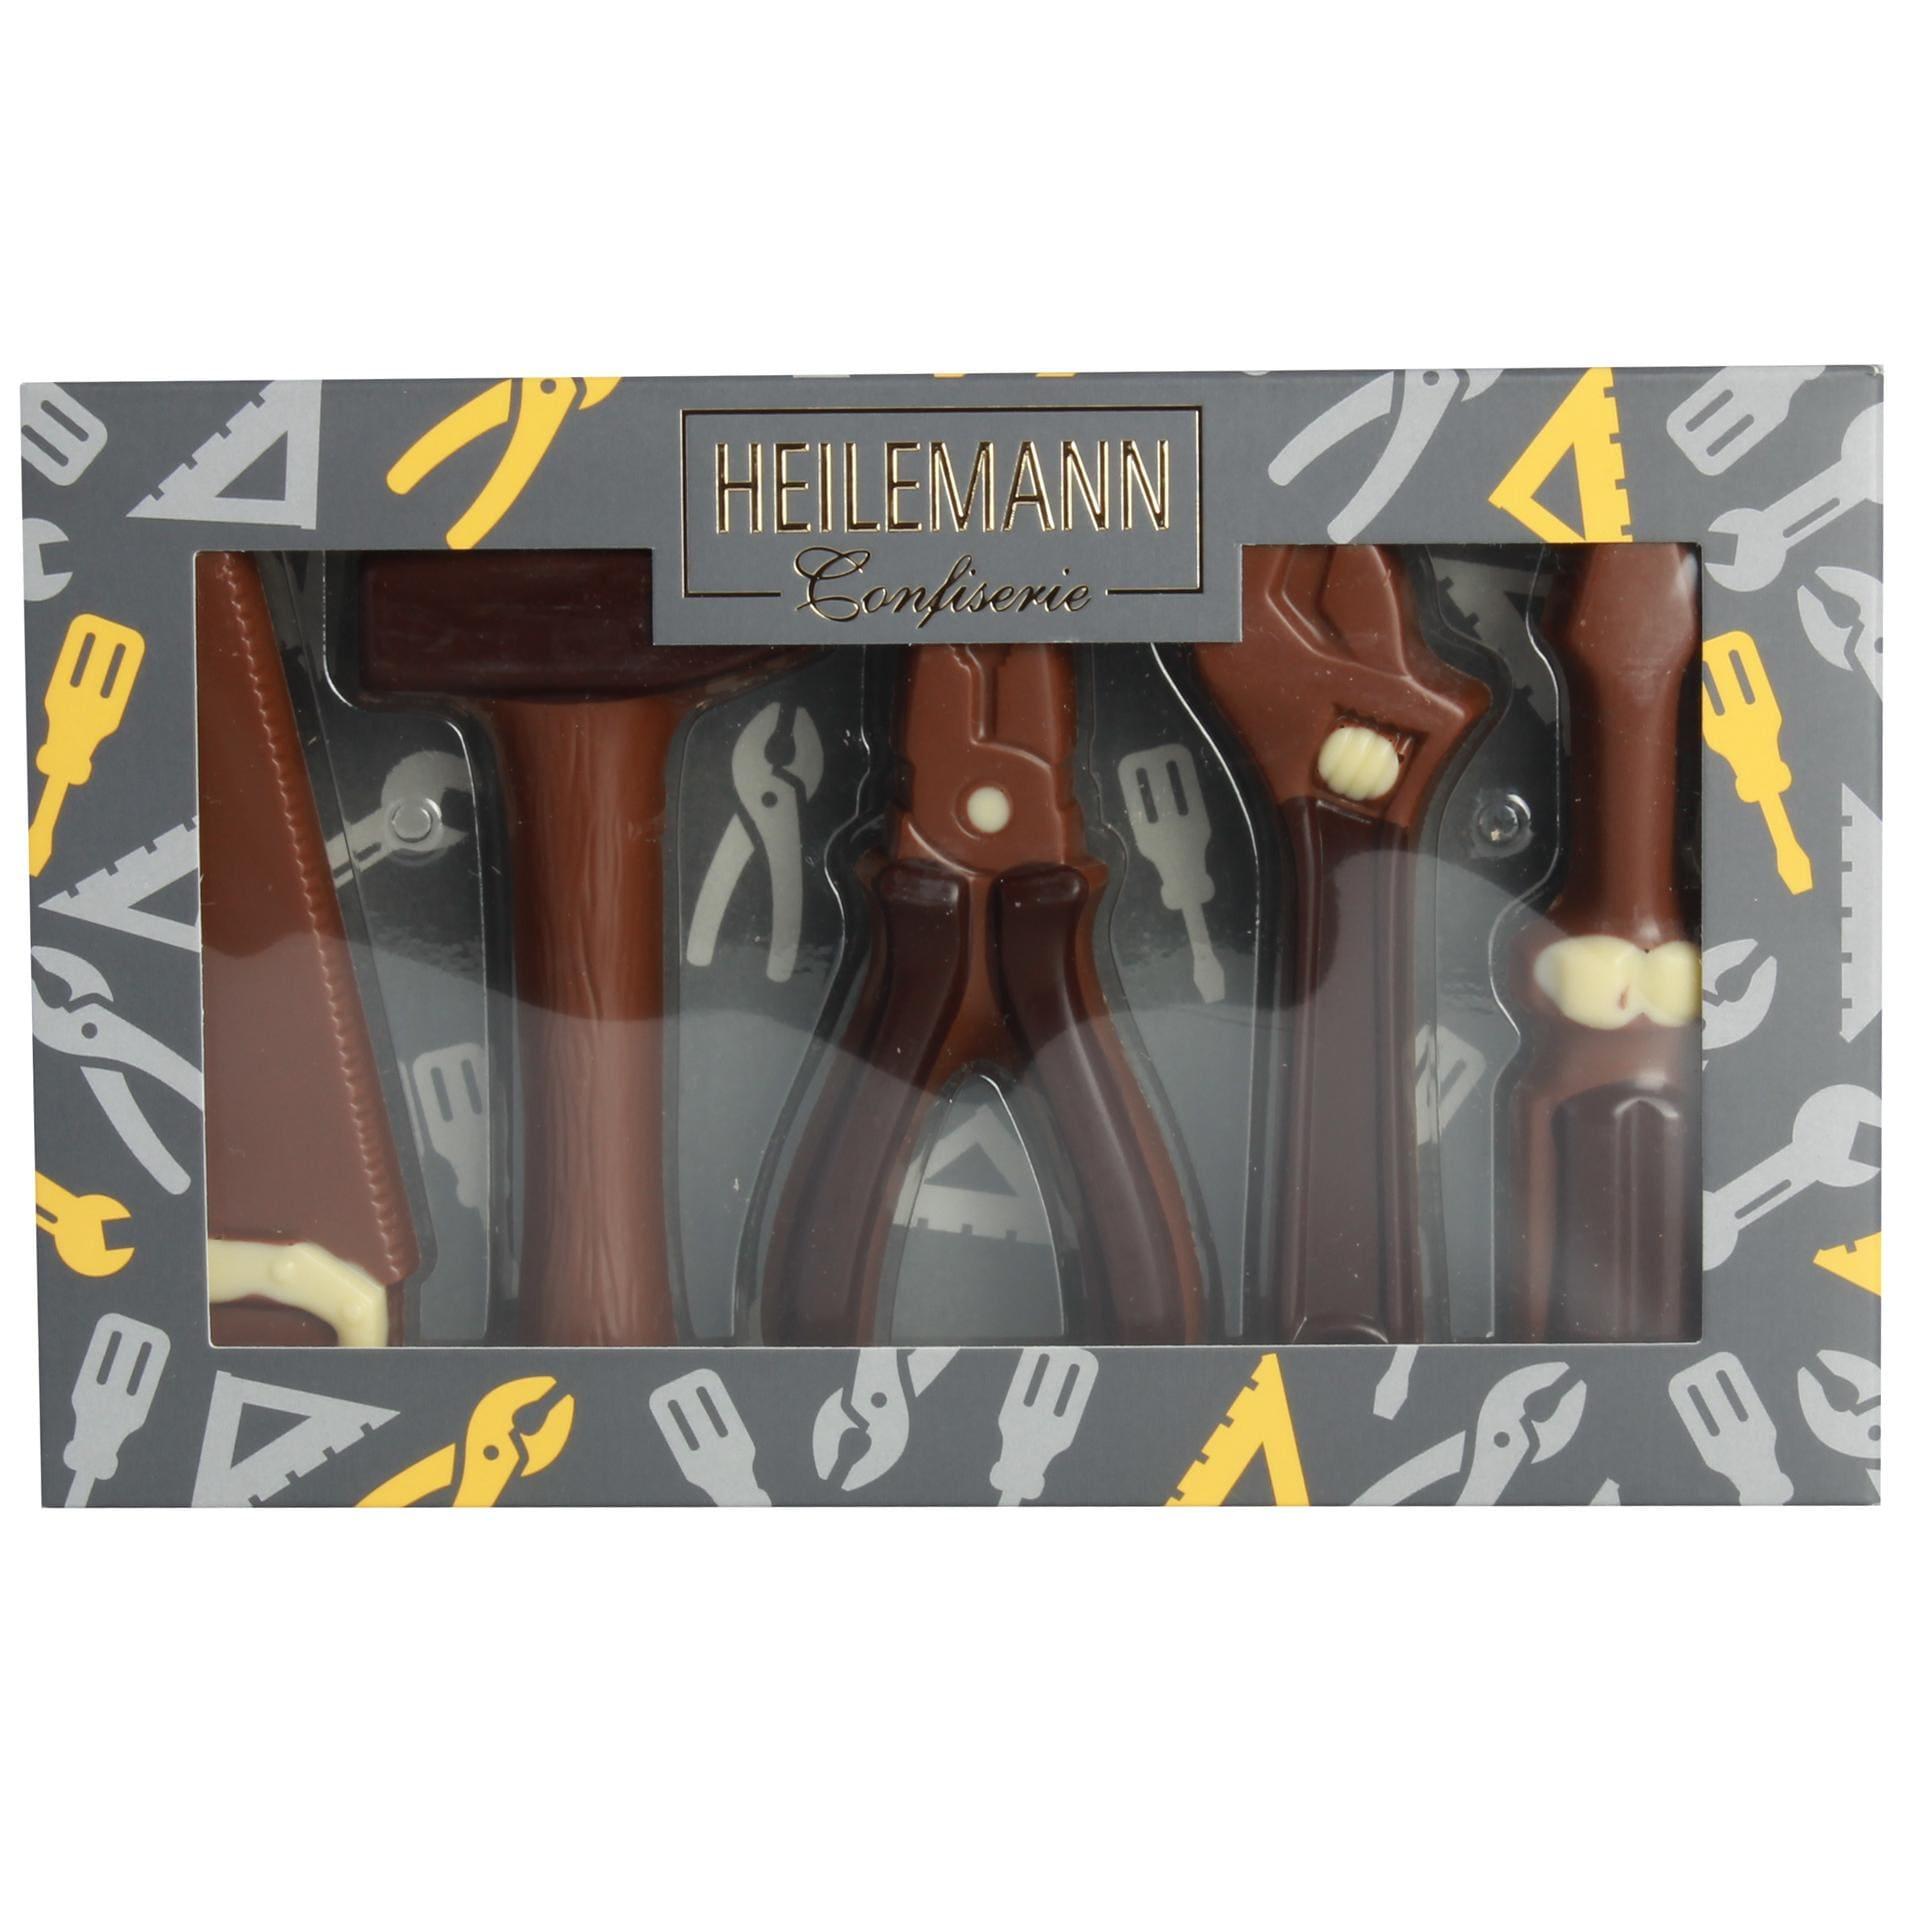 Heilemann - Schoko-Werkzeug Schokoladenfiguren Confiserie Präsent Vollmilchschokolade - 100g